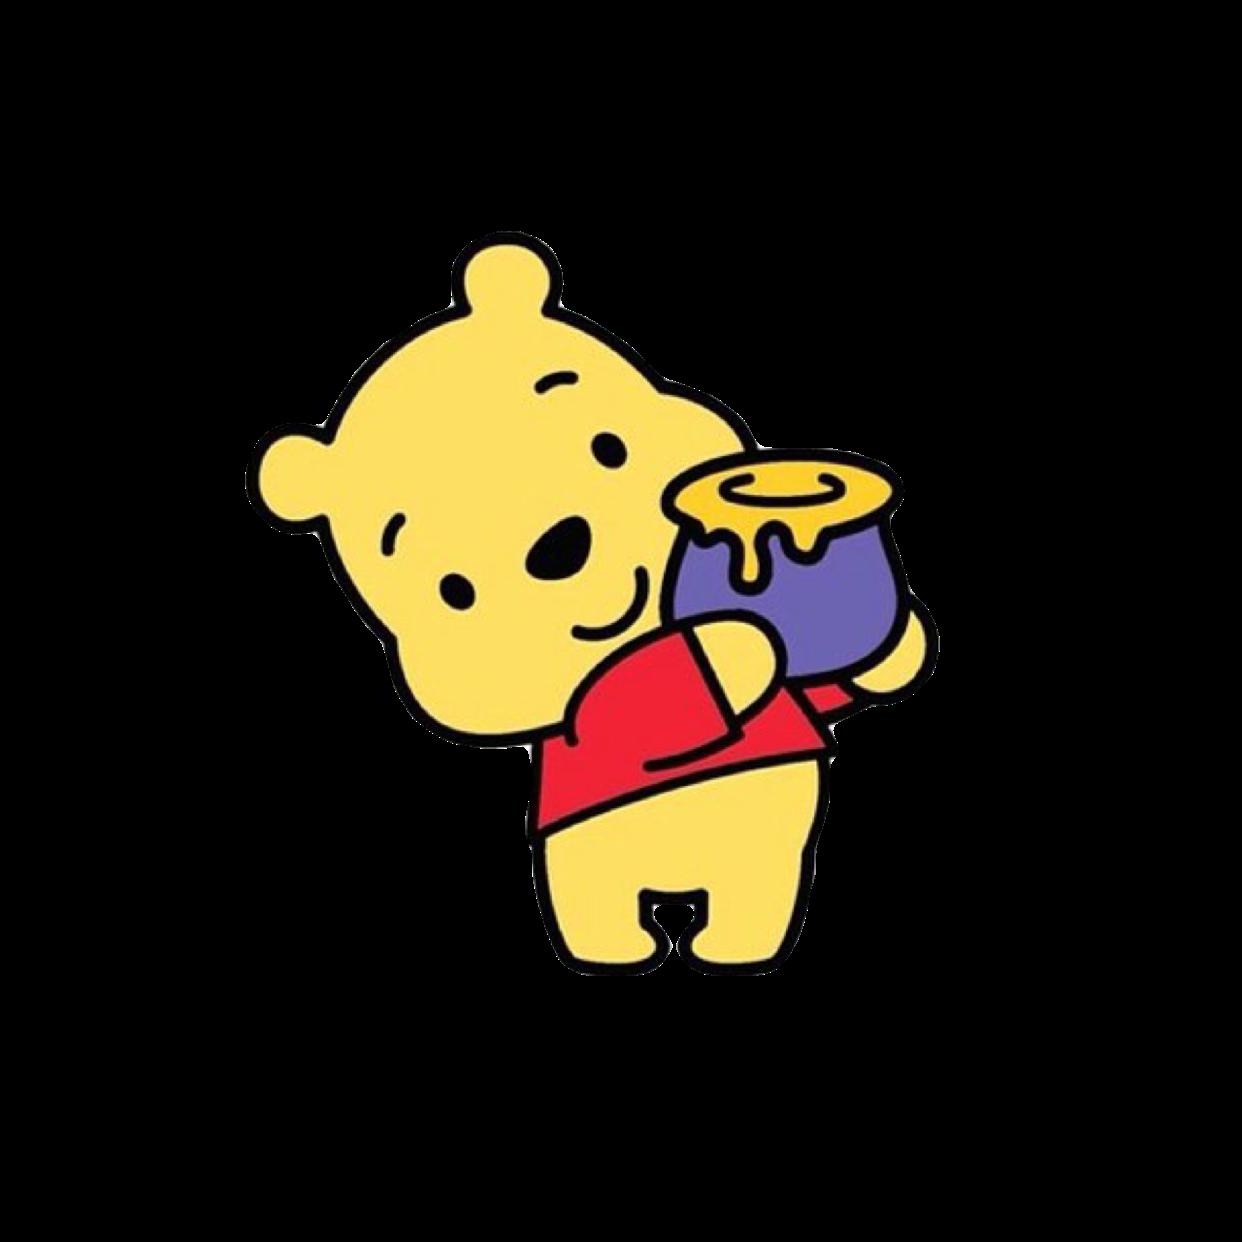 winniethepooh #winnie #the #pooh #cute #bear #yellow #honey.